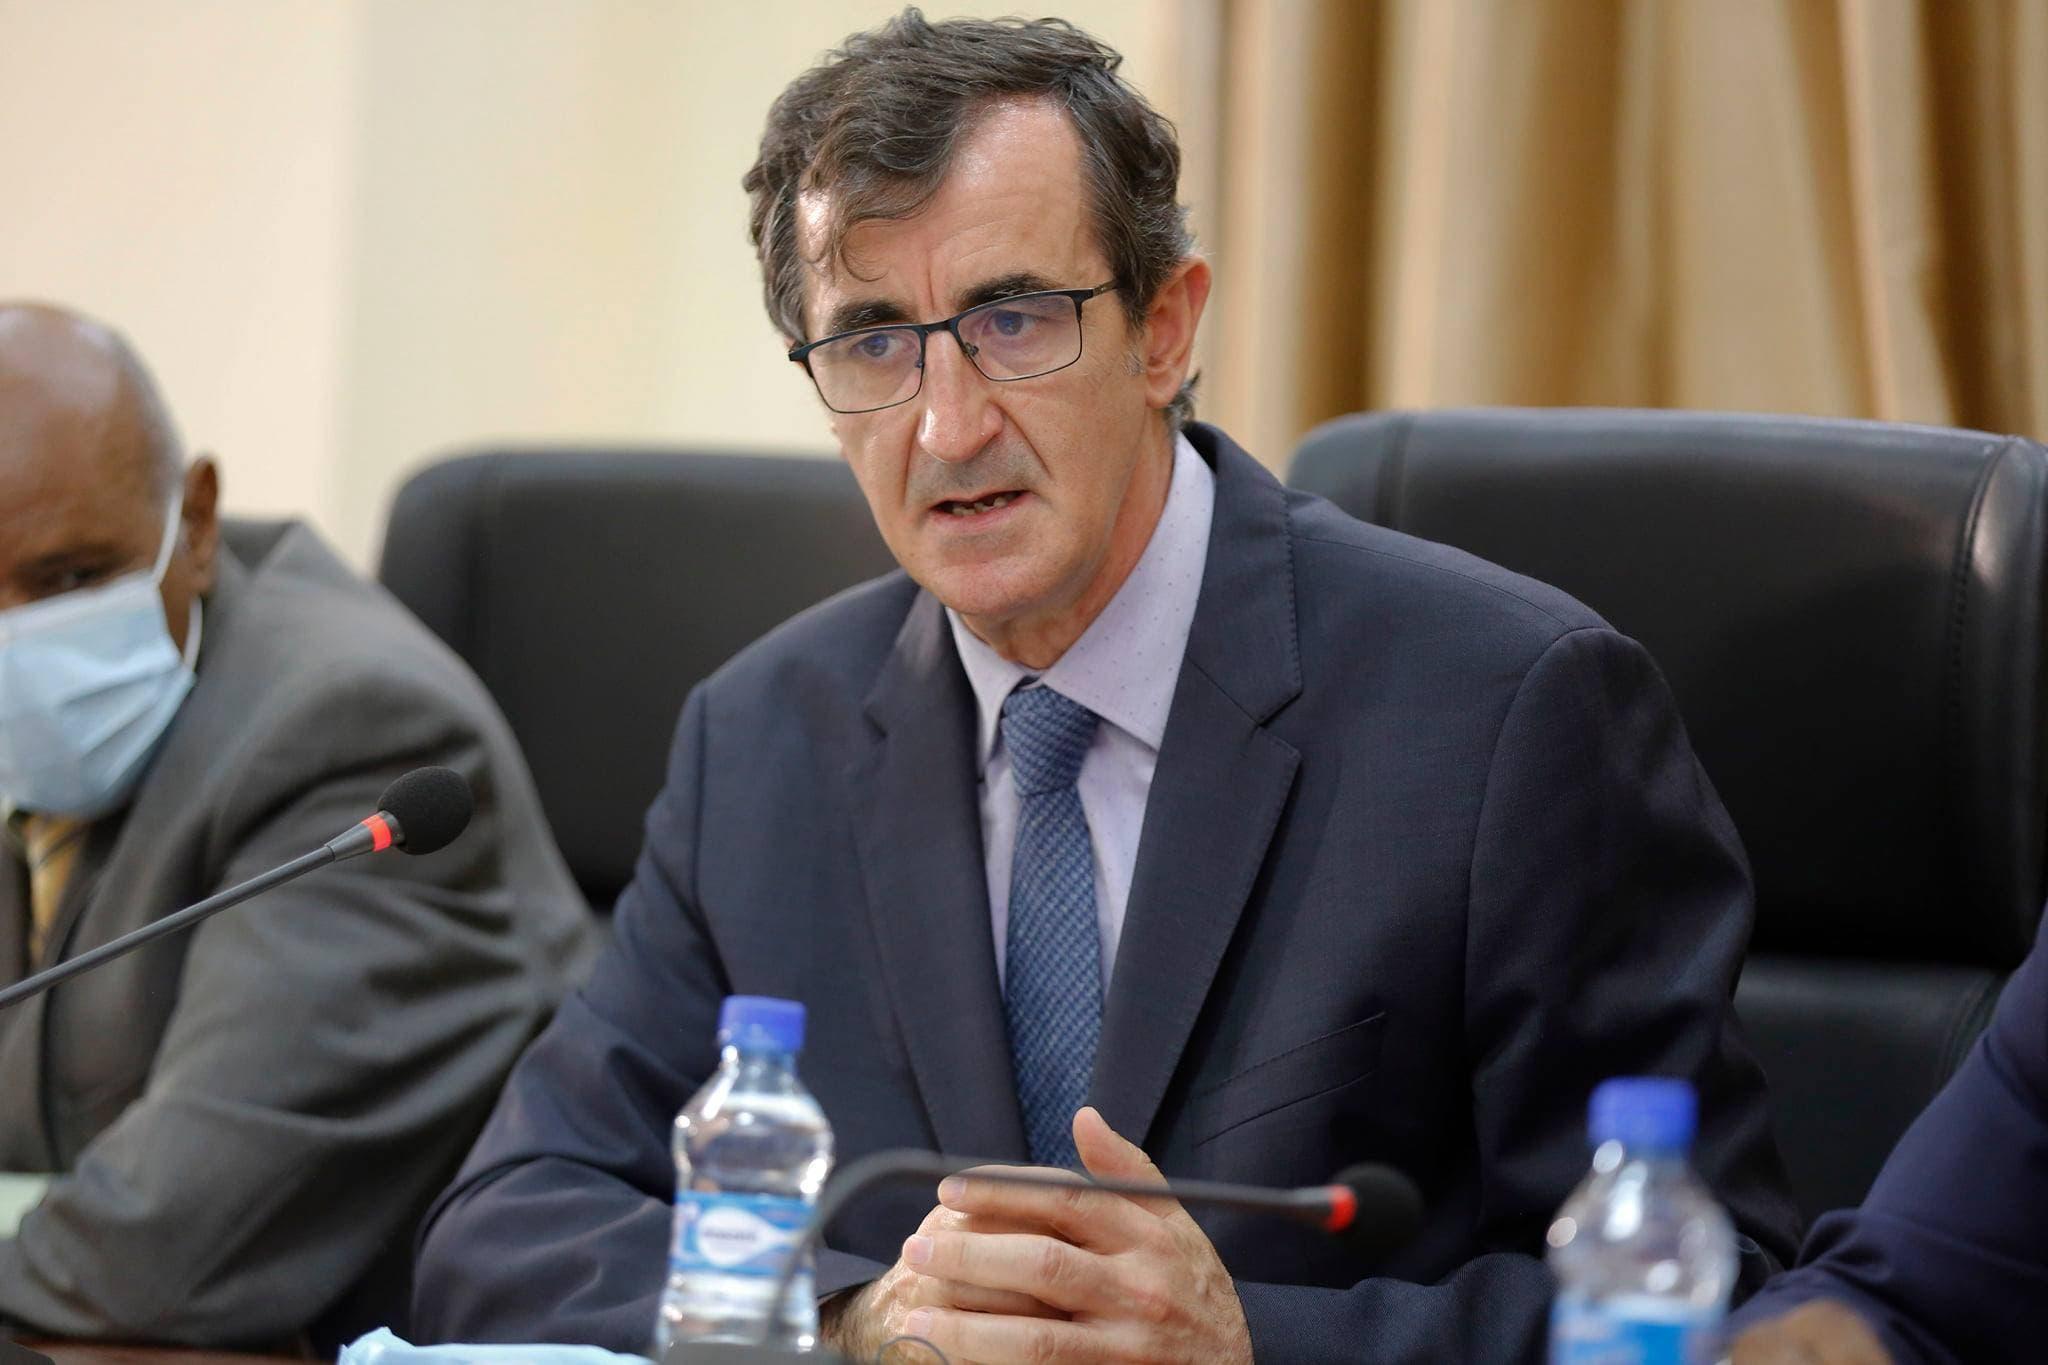 EU urges demilitarization of Mogadishu, Somalia